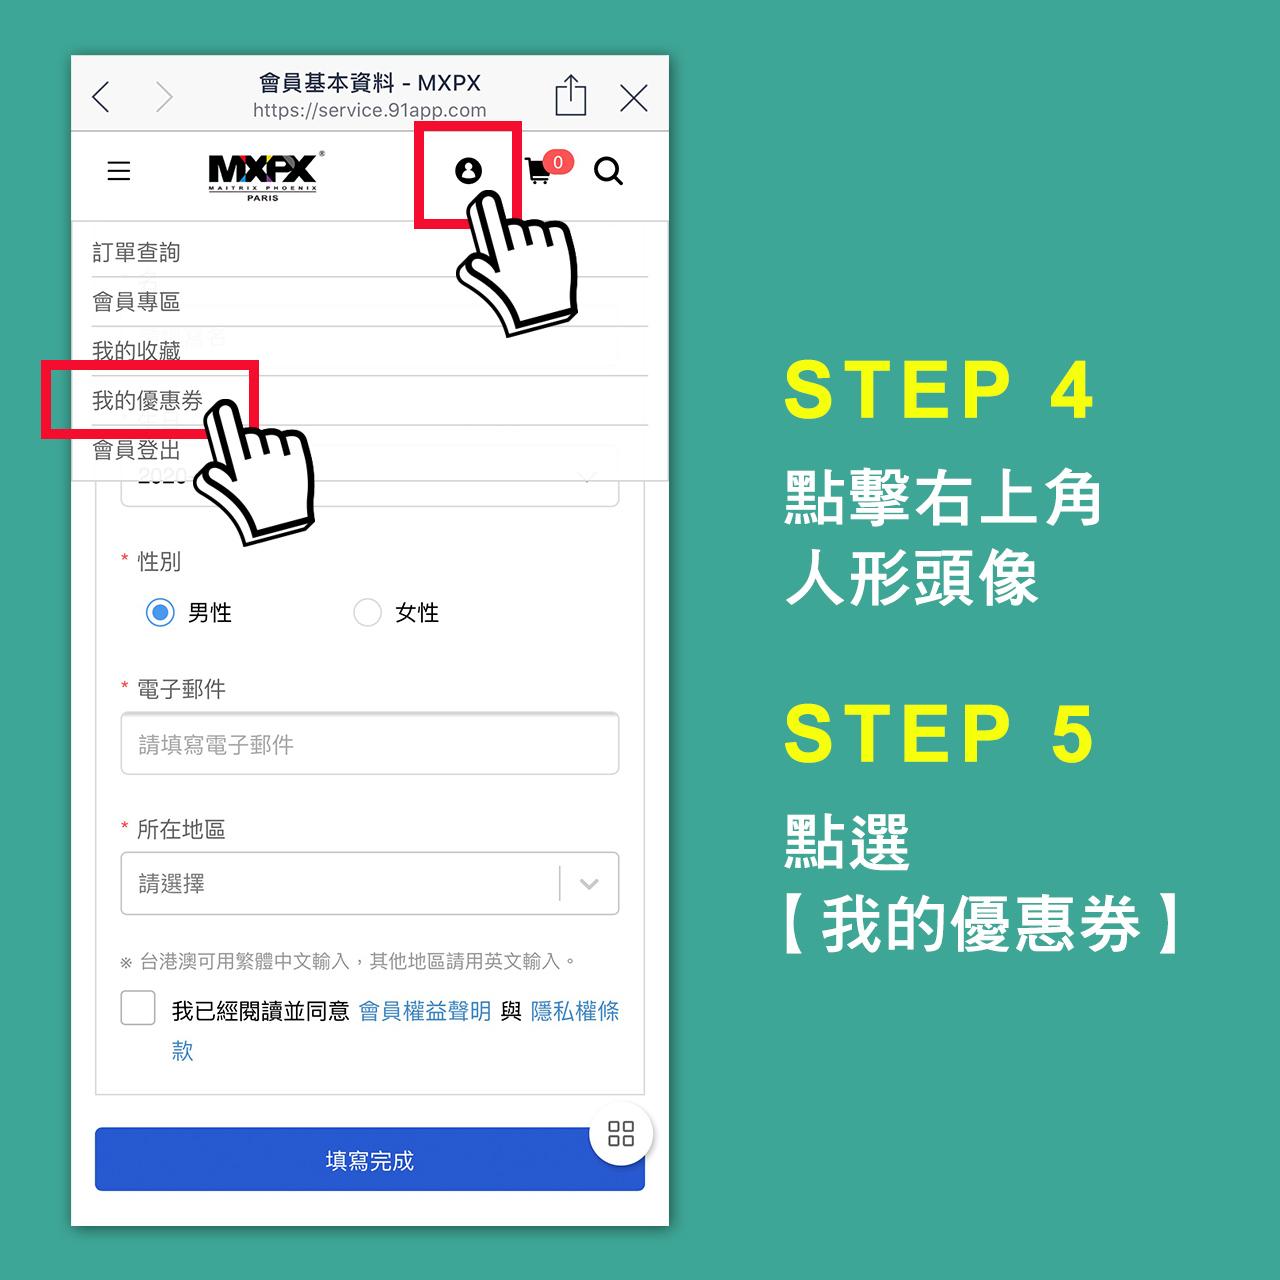 STEP 4-1